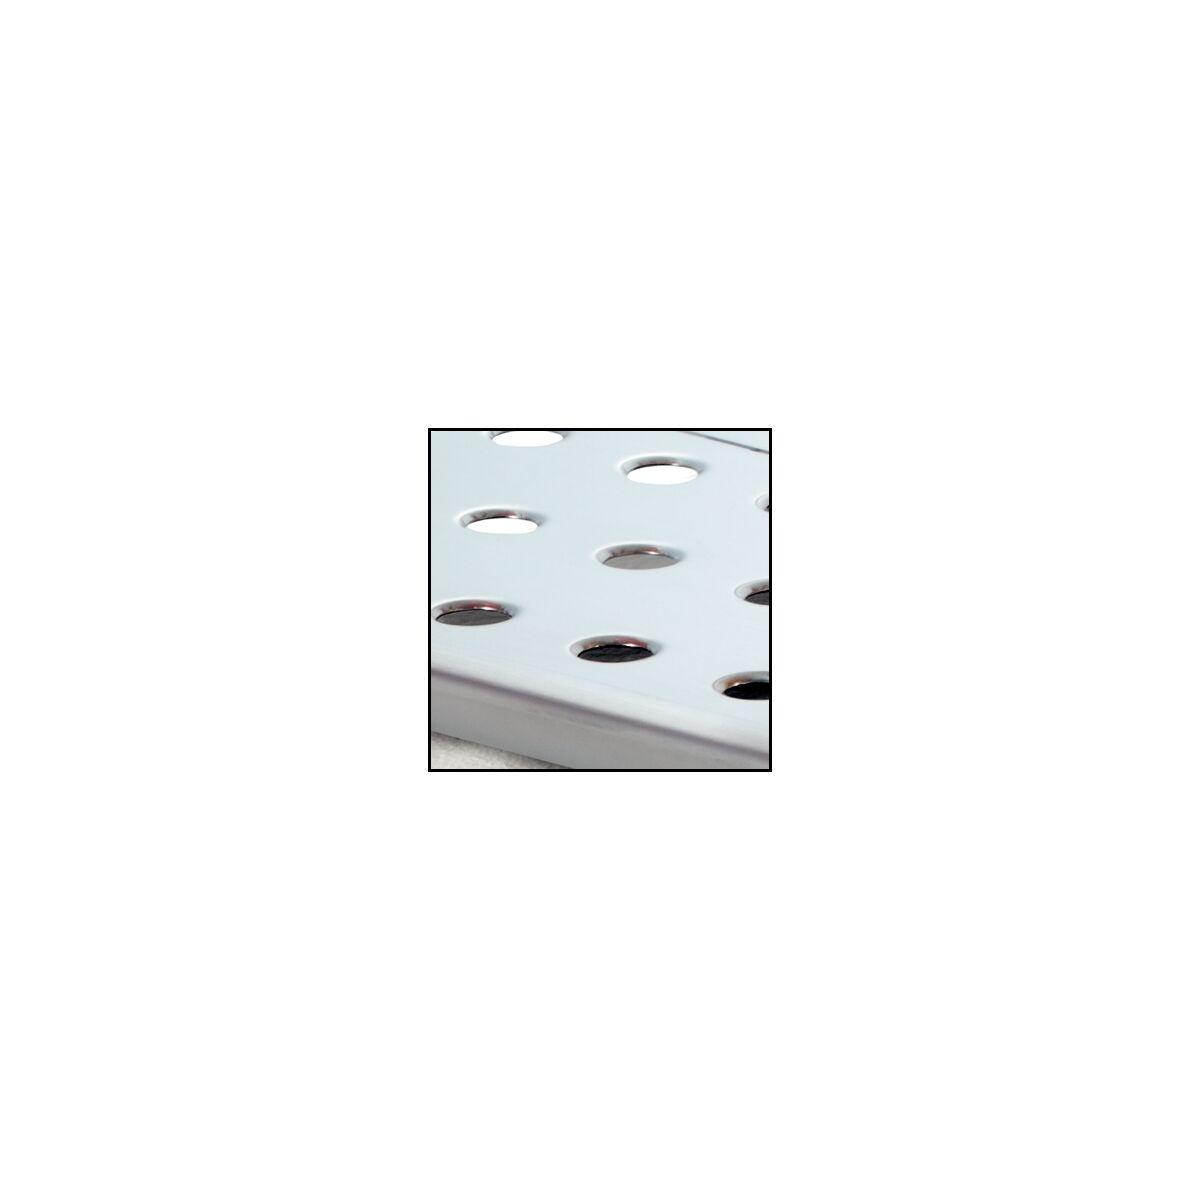 Tramontina - Escurridor de platos de acero inoxidable e02c25effc01